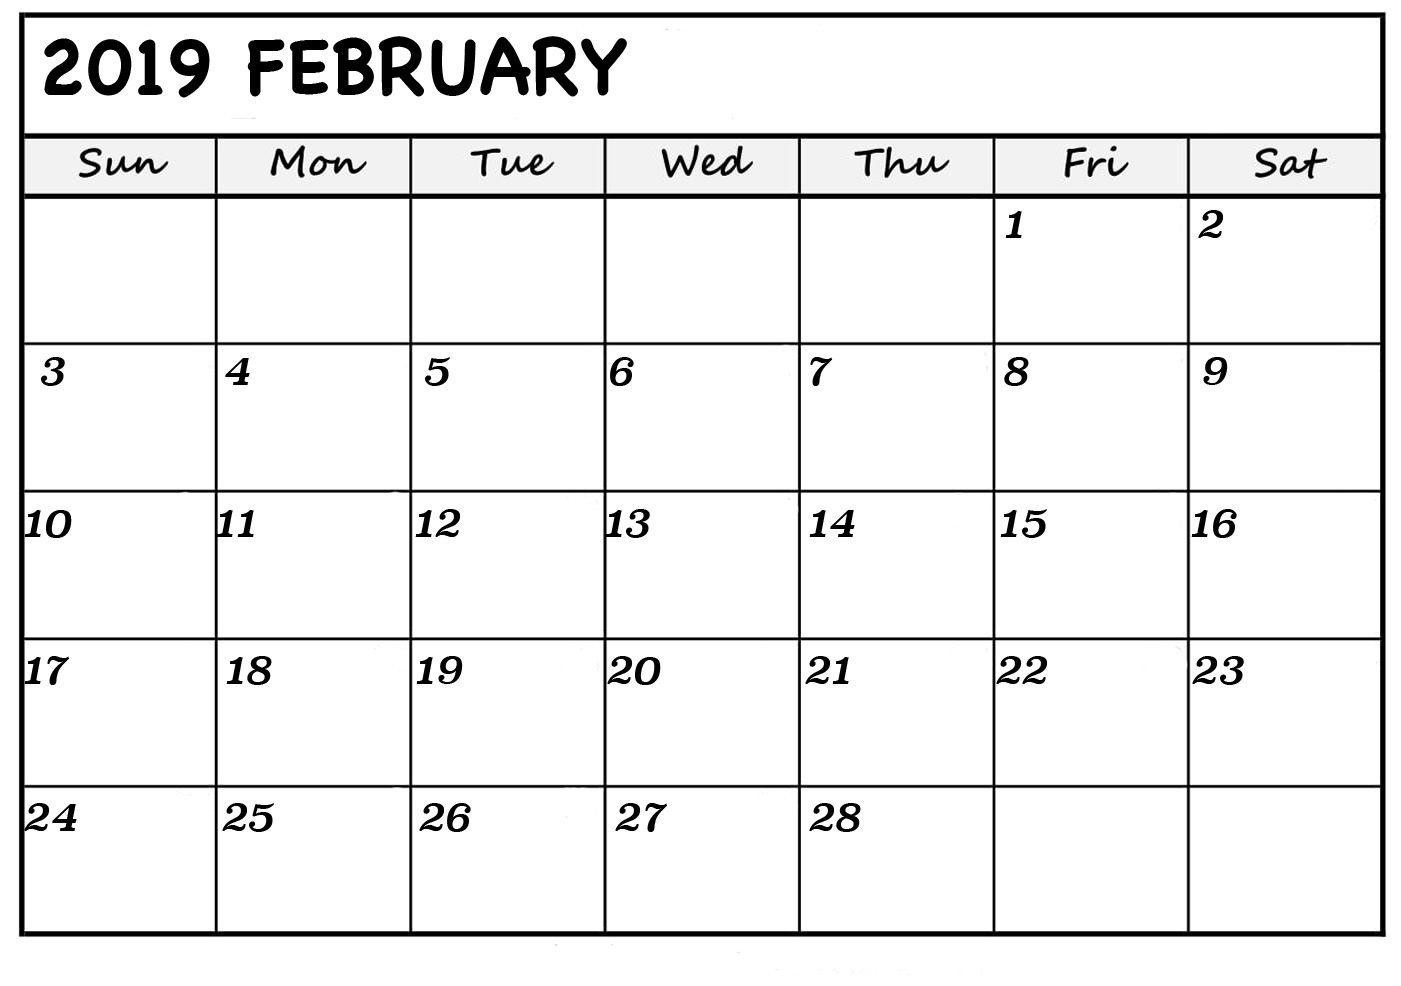 February 2019 Template Editable Calendar Download Free December